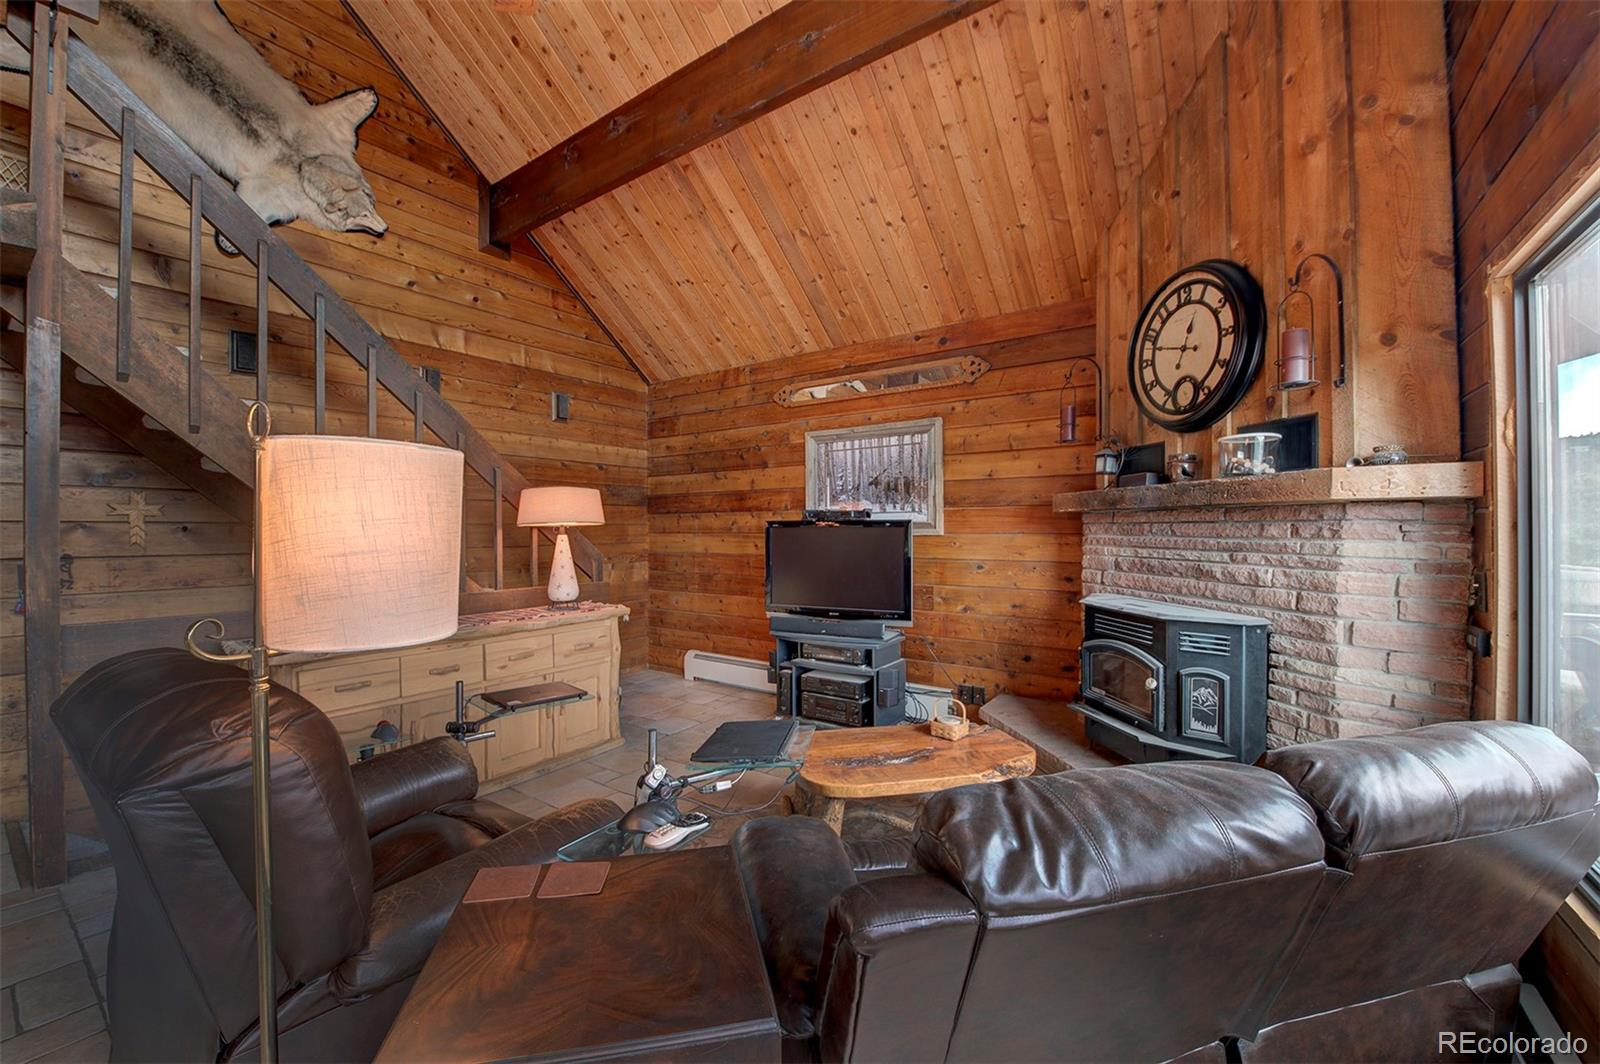 MLS# 6922377 - 7 - 12123 Geronimo Trail, Conifer, CO 80433